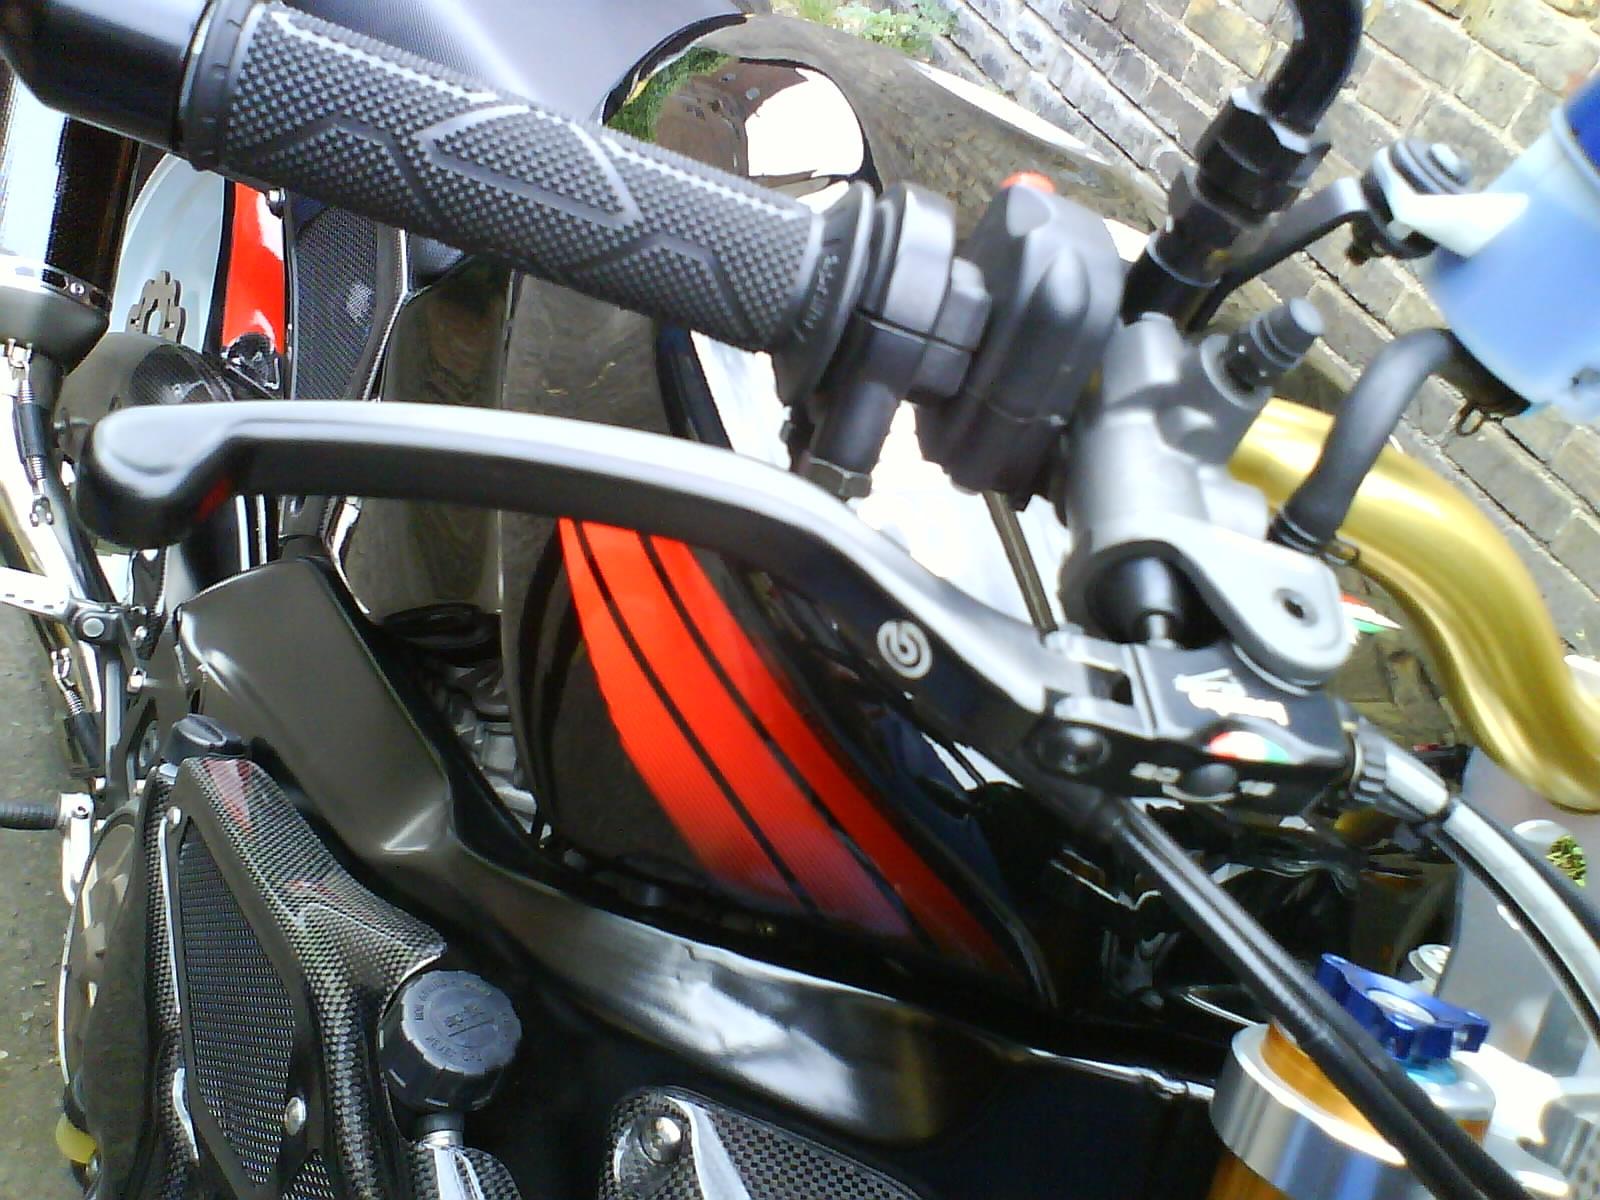 Motorbike Accessories Ebay Uk Ash Cycles